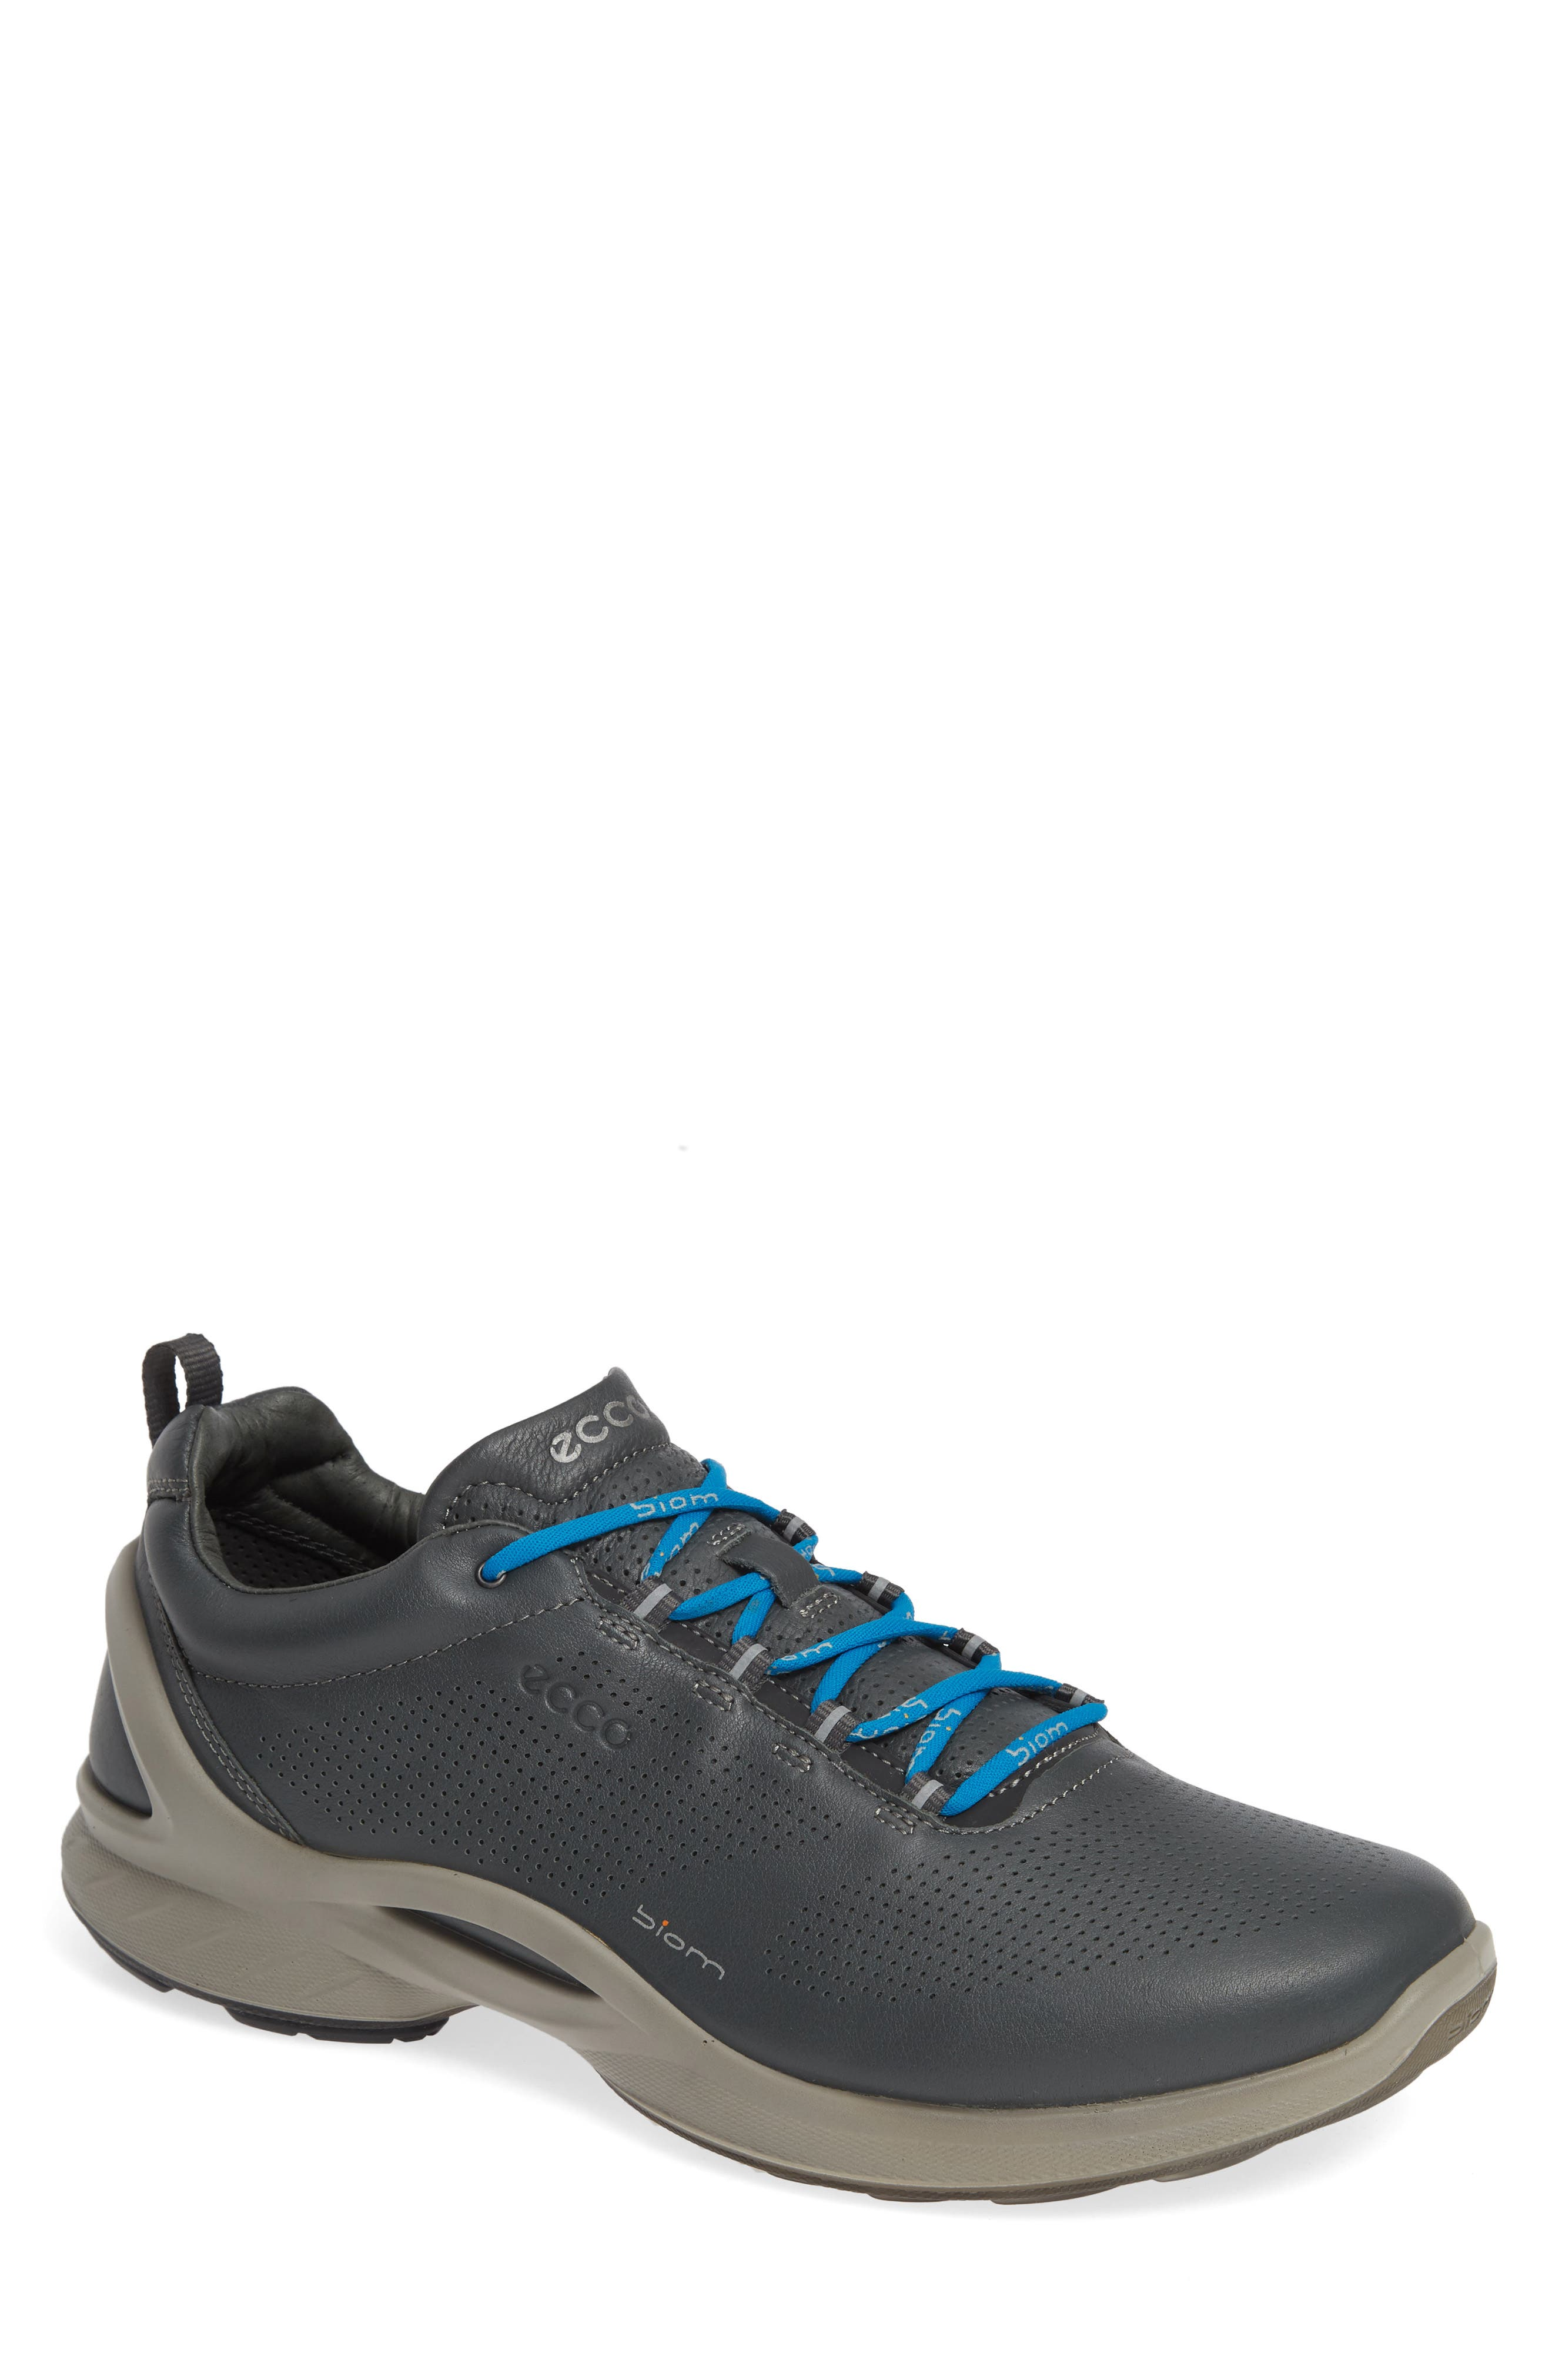 'BIOM Fjuel' Sneaker,                             Main thumbnail 1, color,                             DARK SHADOW LEATHER